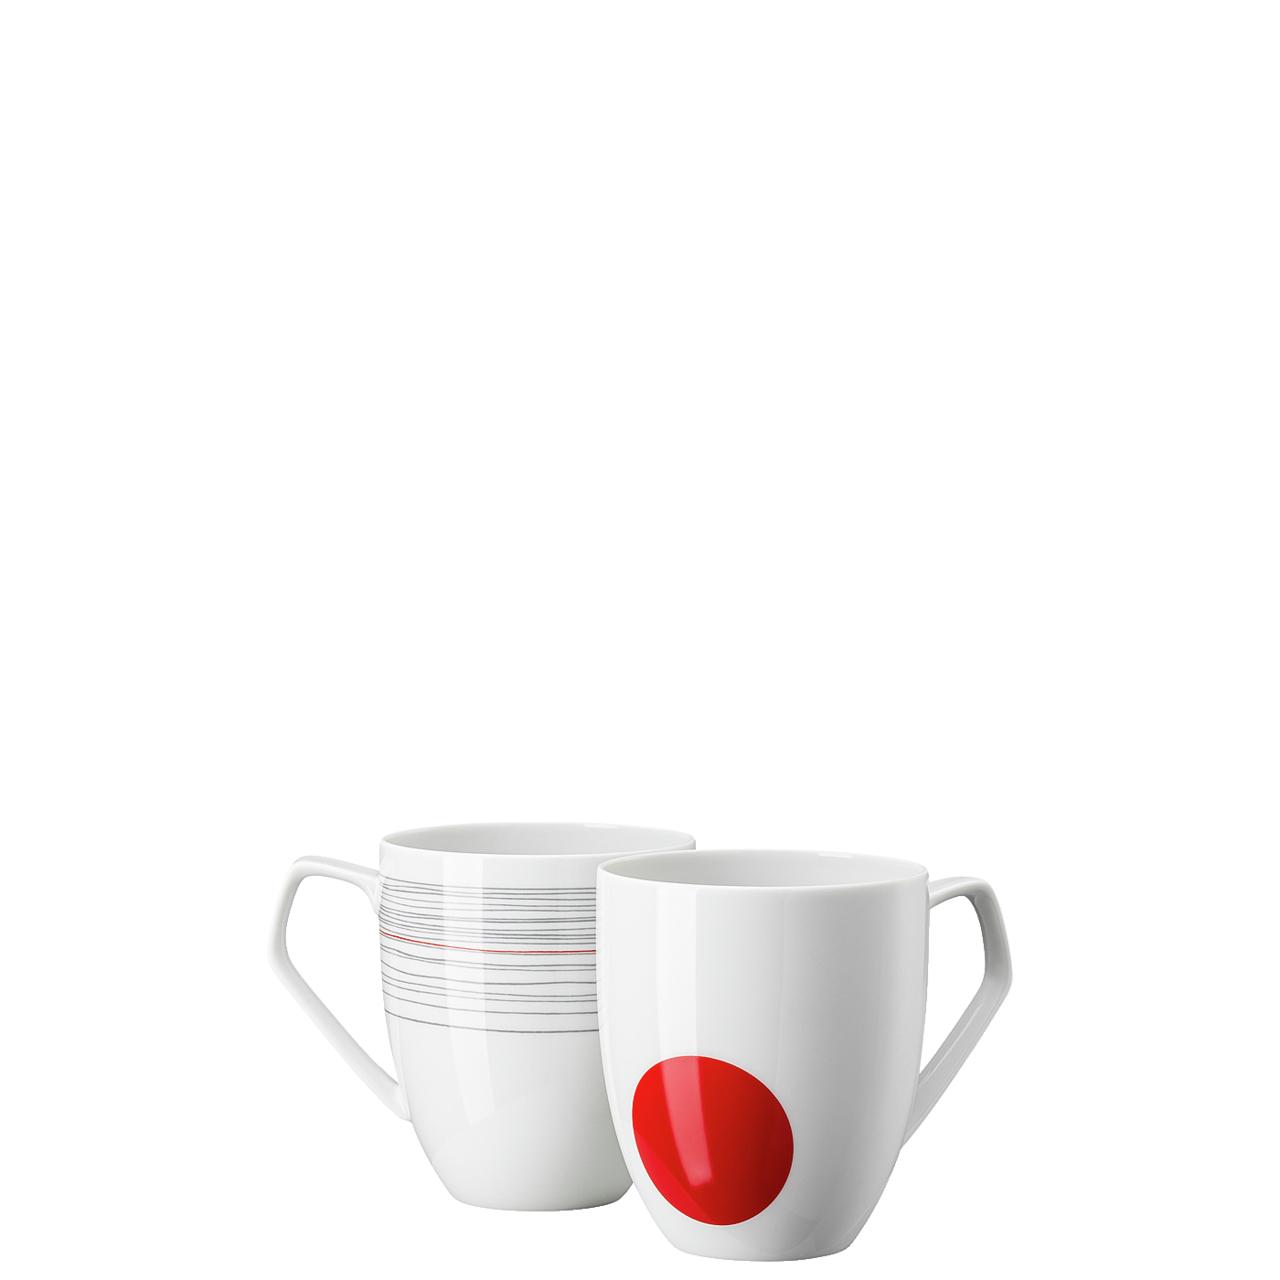 Set 2 Becher mit Henkel TAC Gropius Stripes 2.0 Rosenthal Studio Line